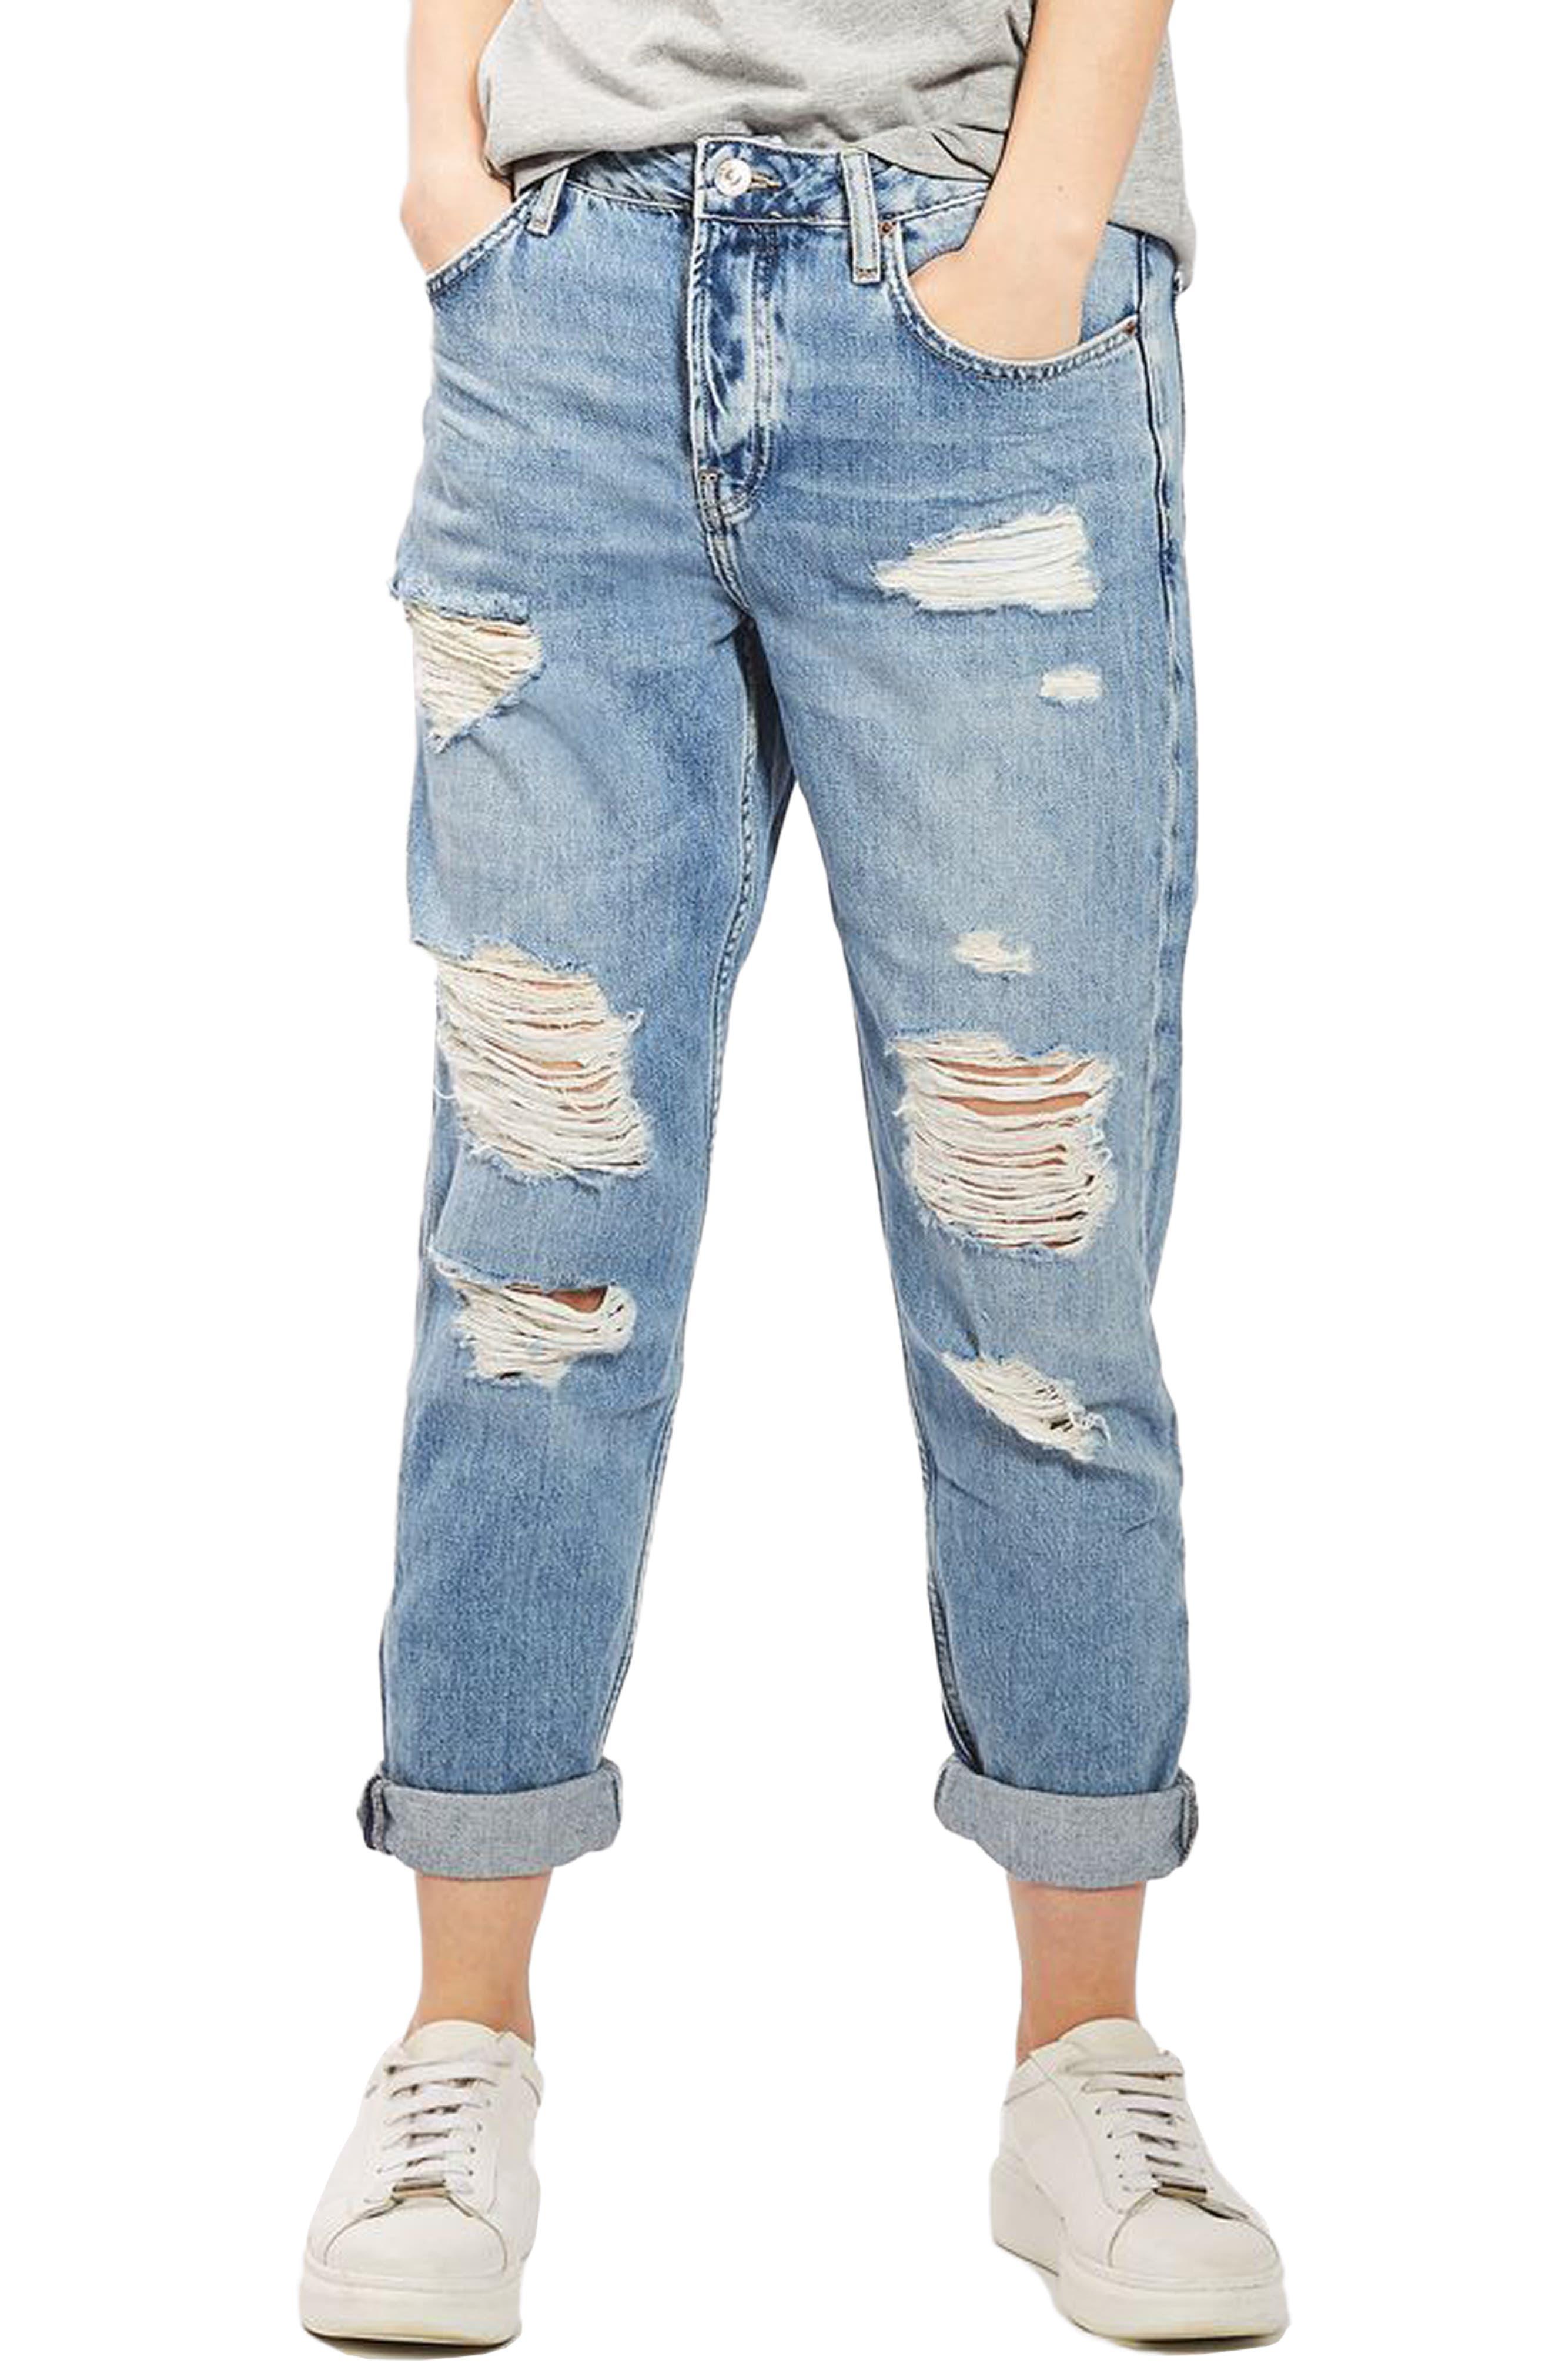 Topshop Distressed Jeans & Denim for Women: Skinny, Boyfriend ...